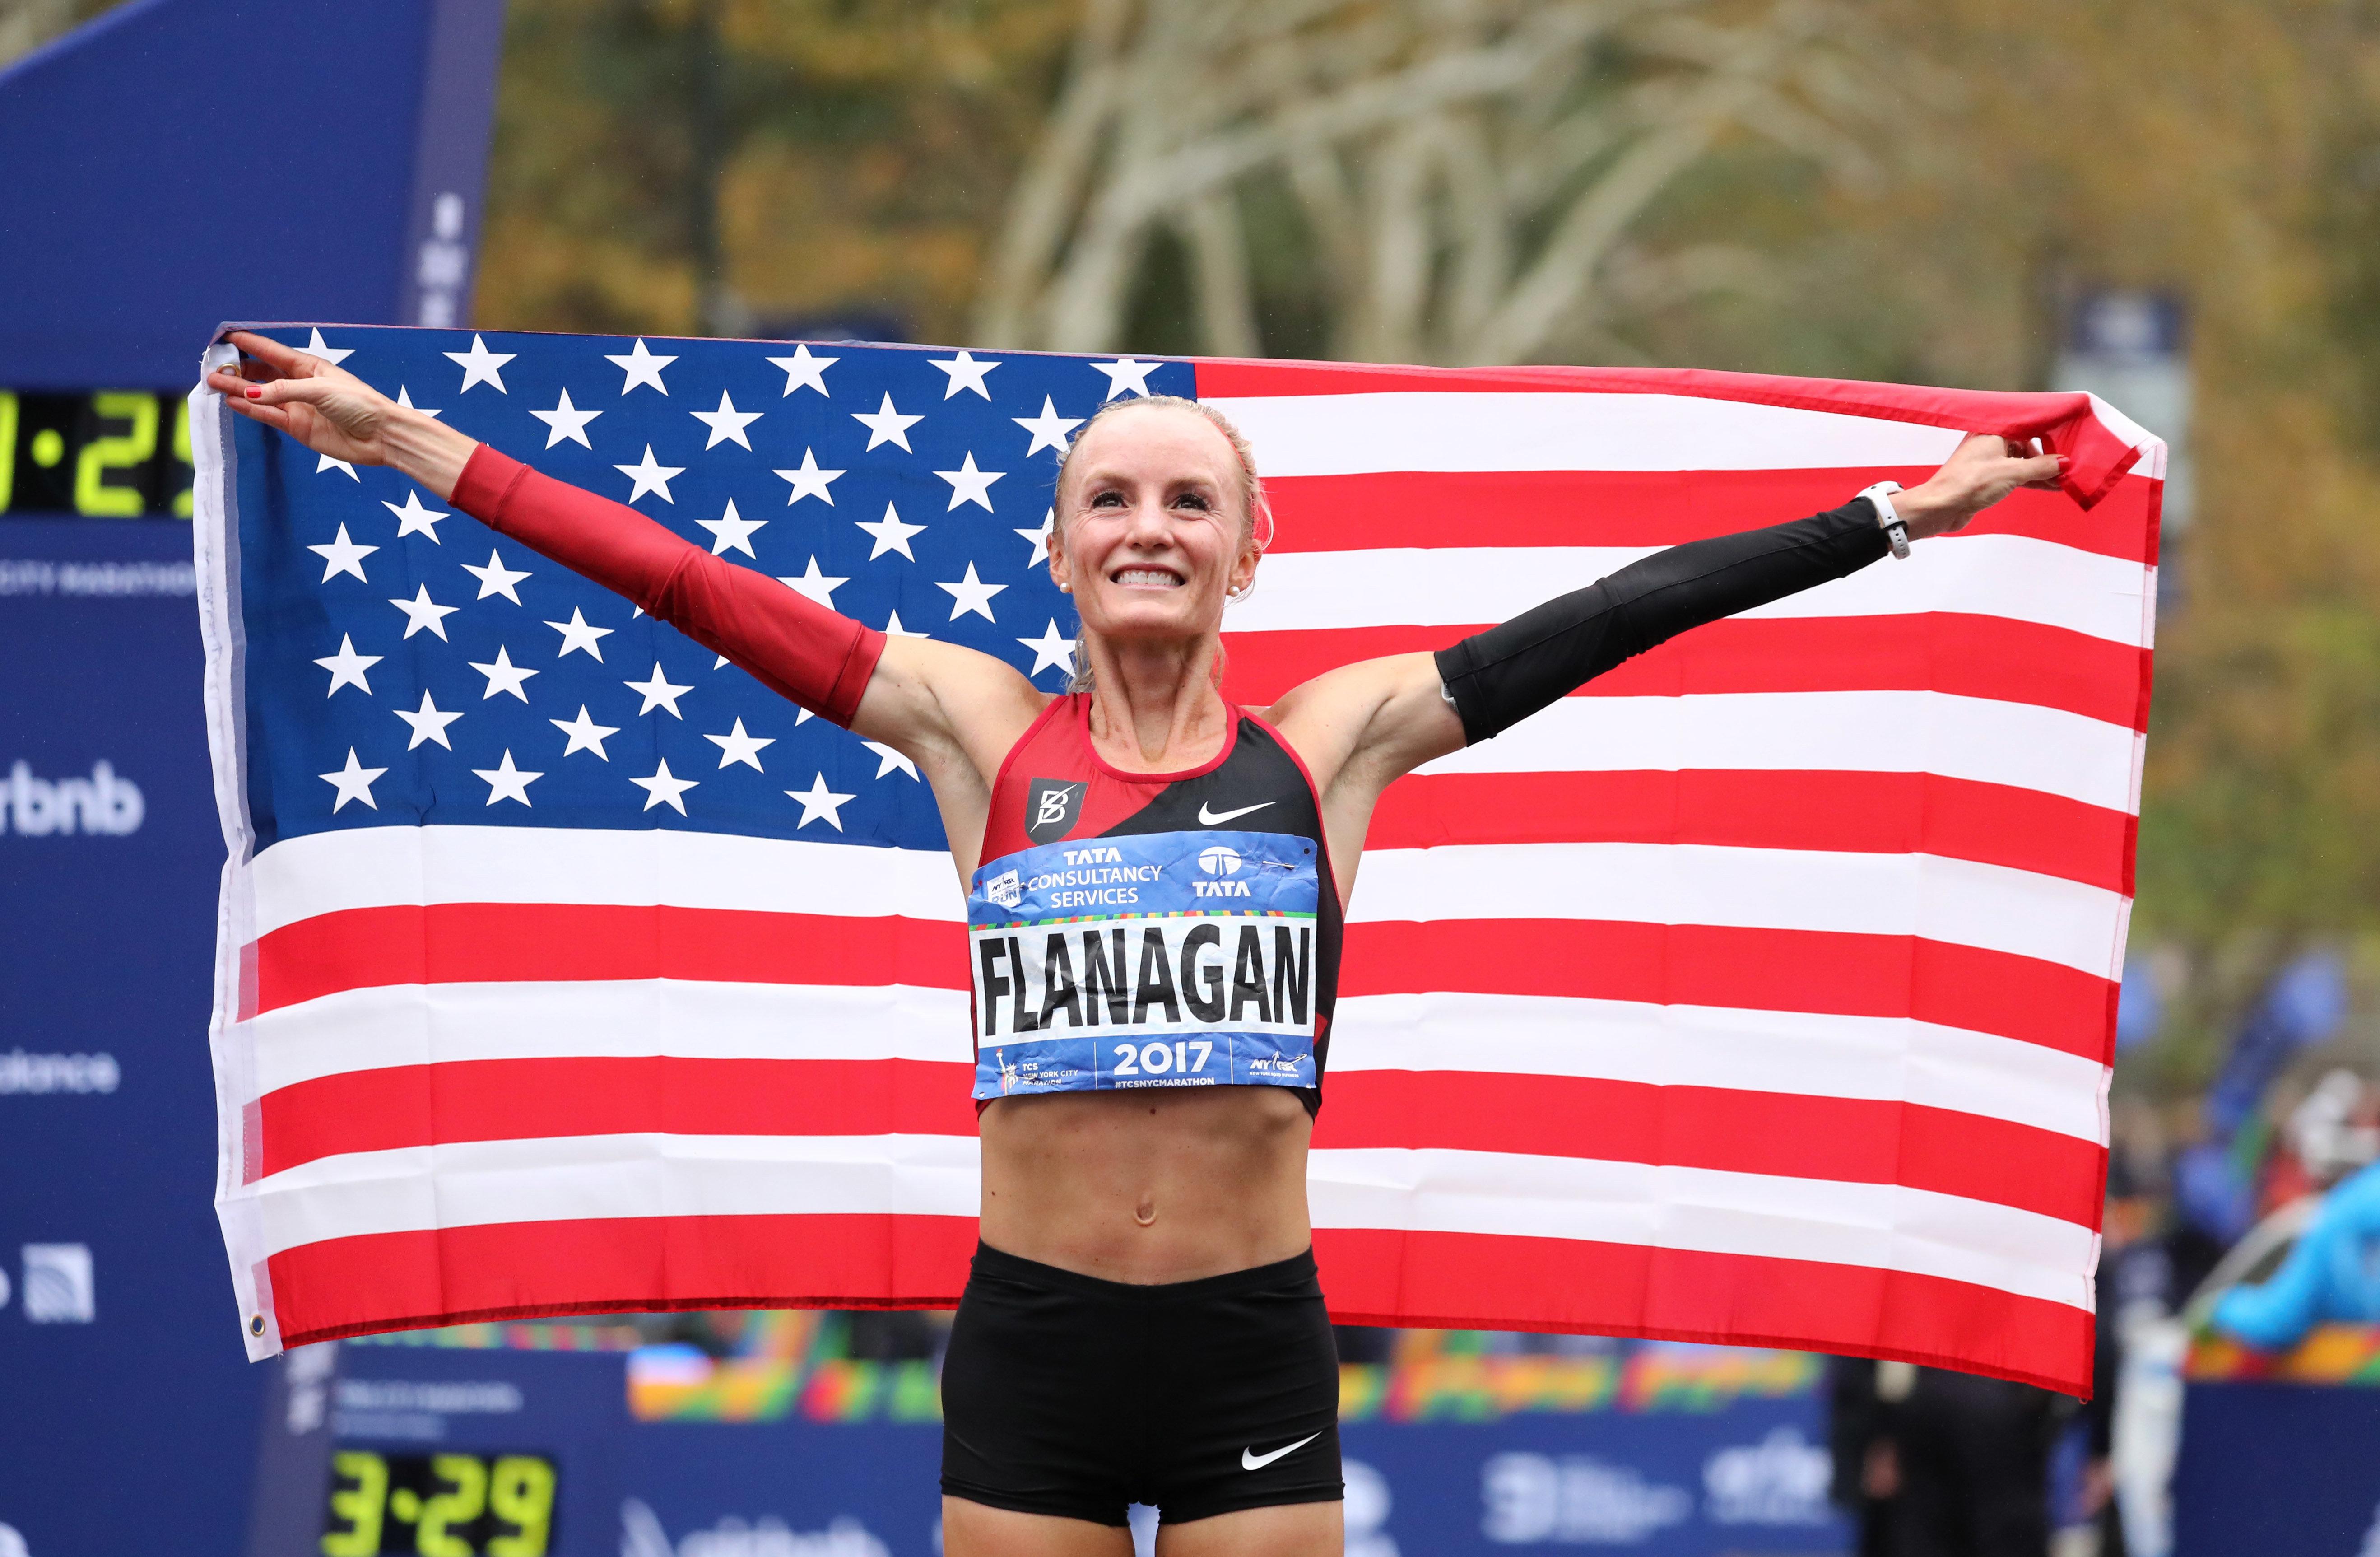 Shalane Flanagan celebrates her victory on Sunday in the New York City Marathon.